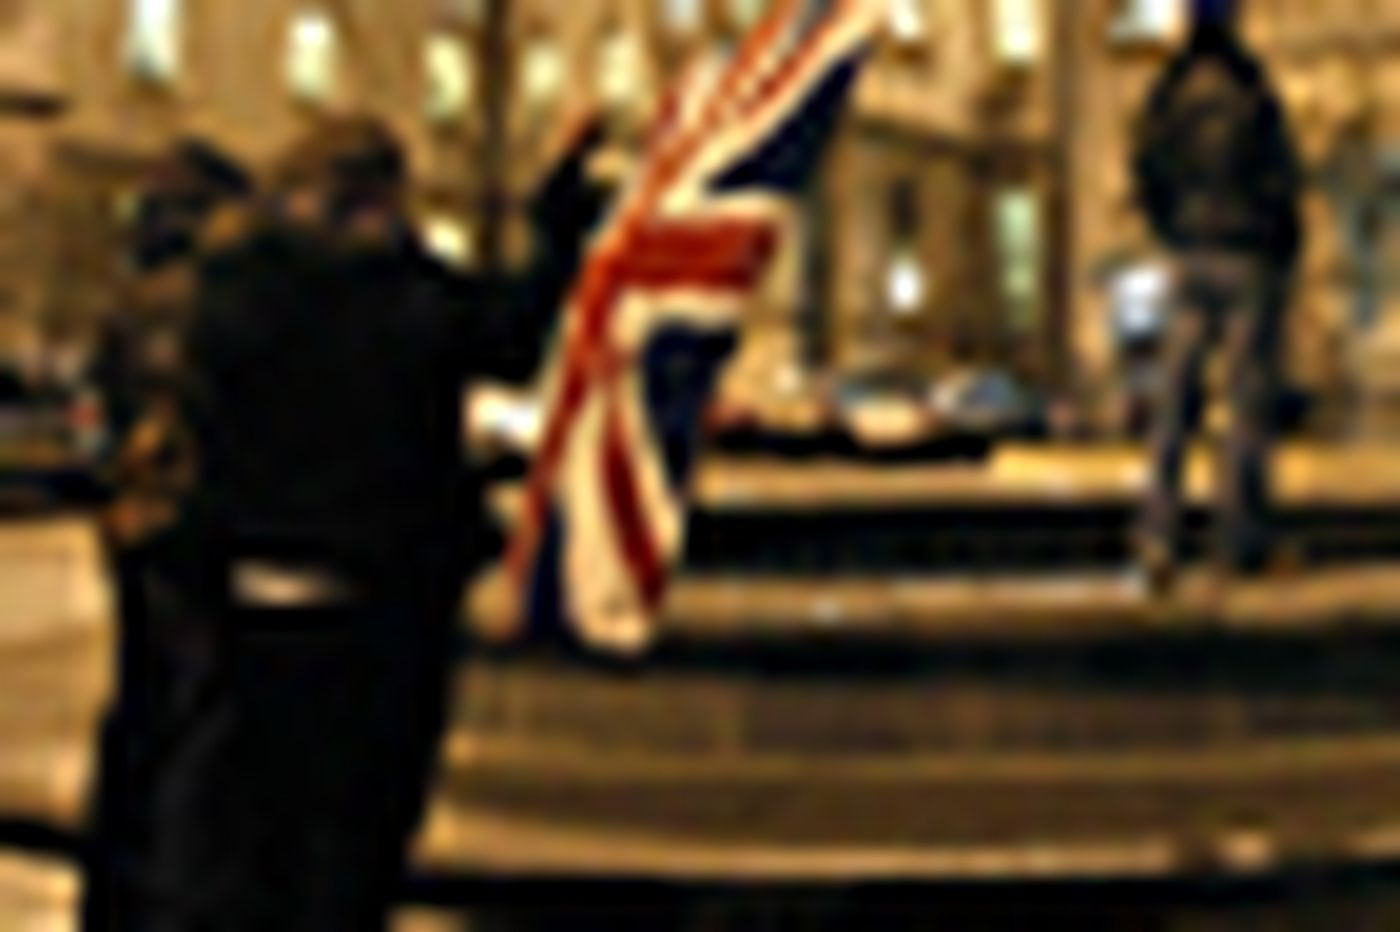 Protestants riot in N. Ireland